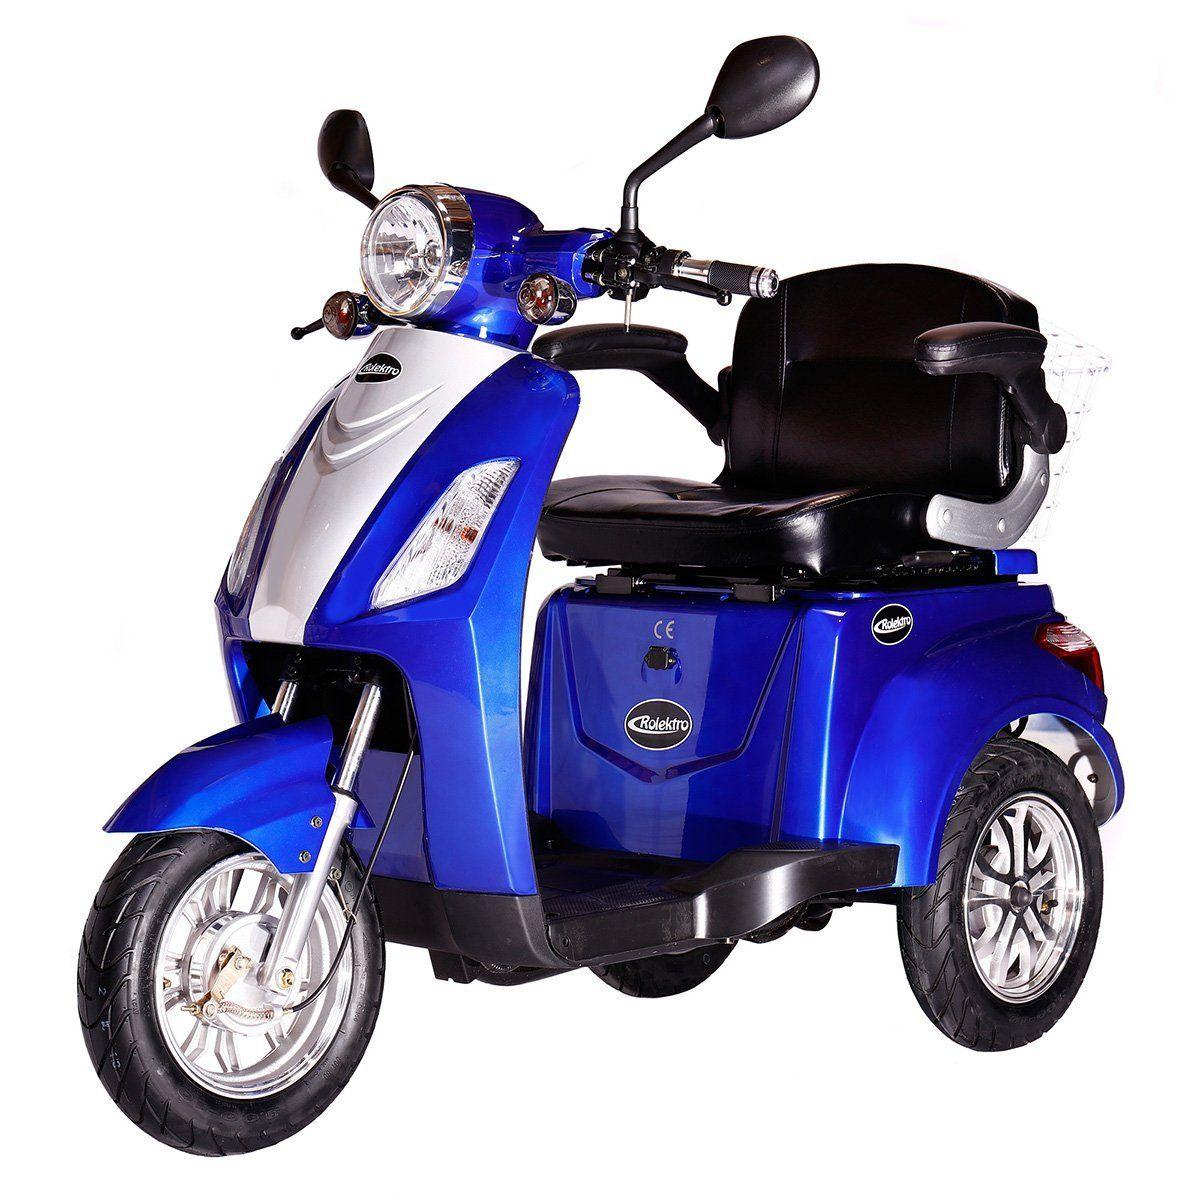 Rolektro Electric Trike 25 Eu Legal Electric Scooter E Scooter 600 W Motor 50 Km 25 Km H Hoschst Speed Eroller Elect Elektroroller Elektrisches Dreirad Dreirad